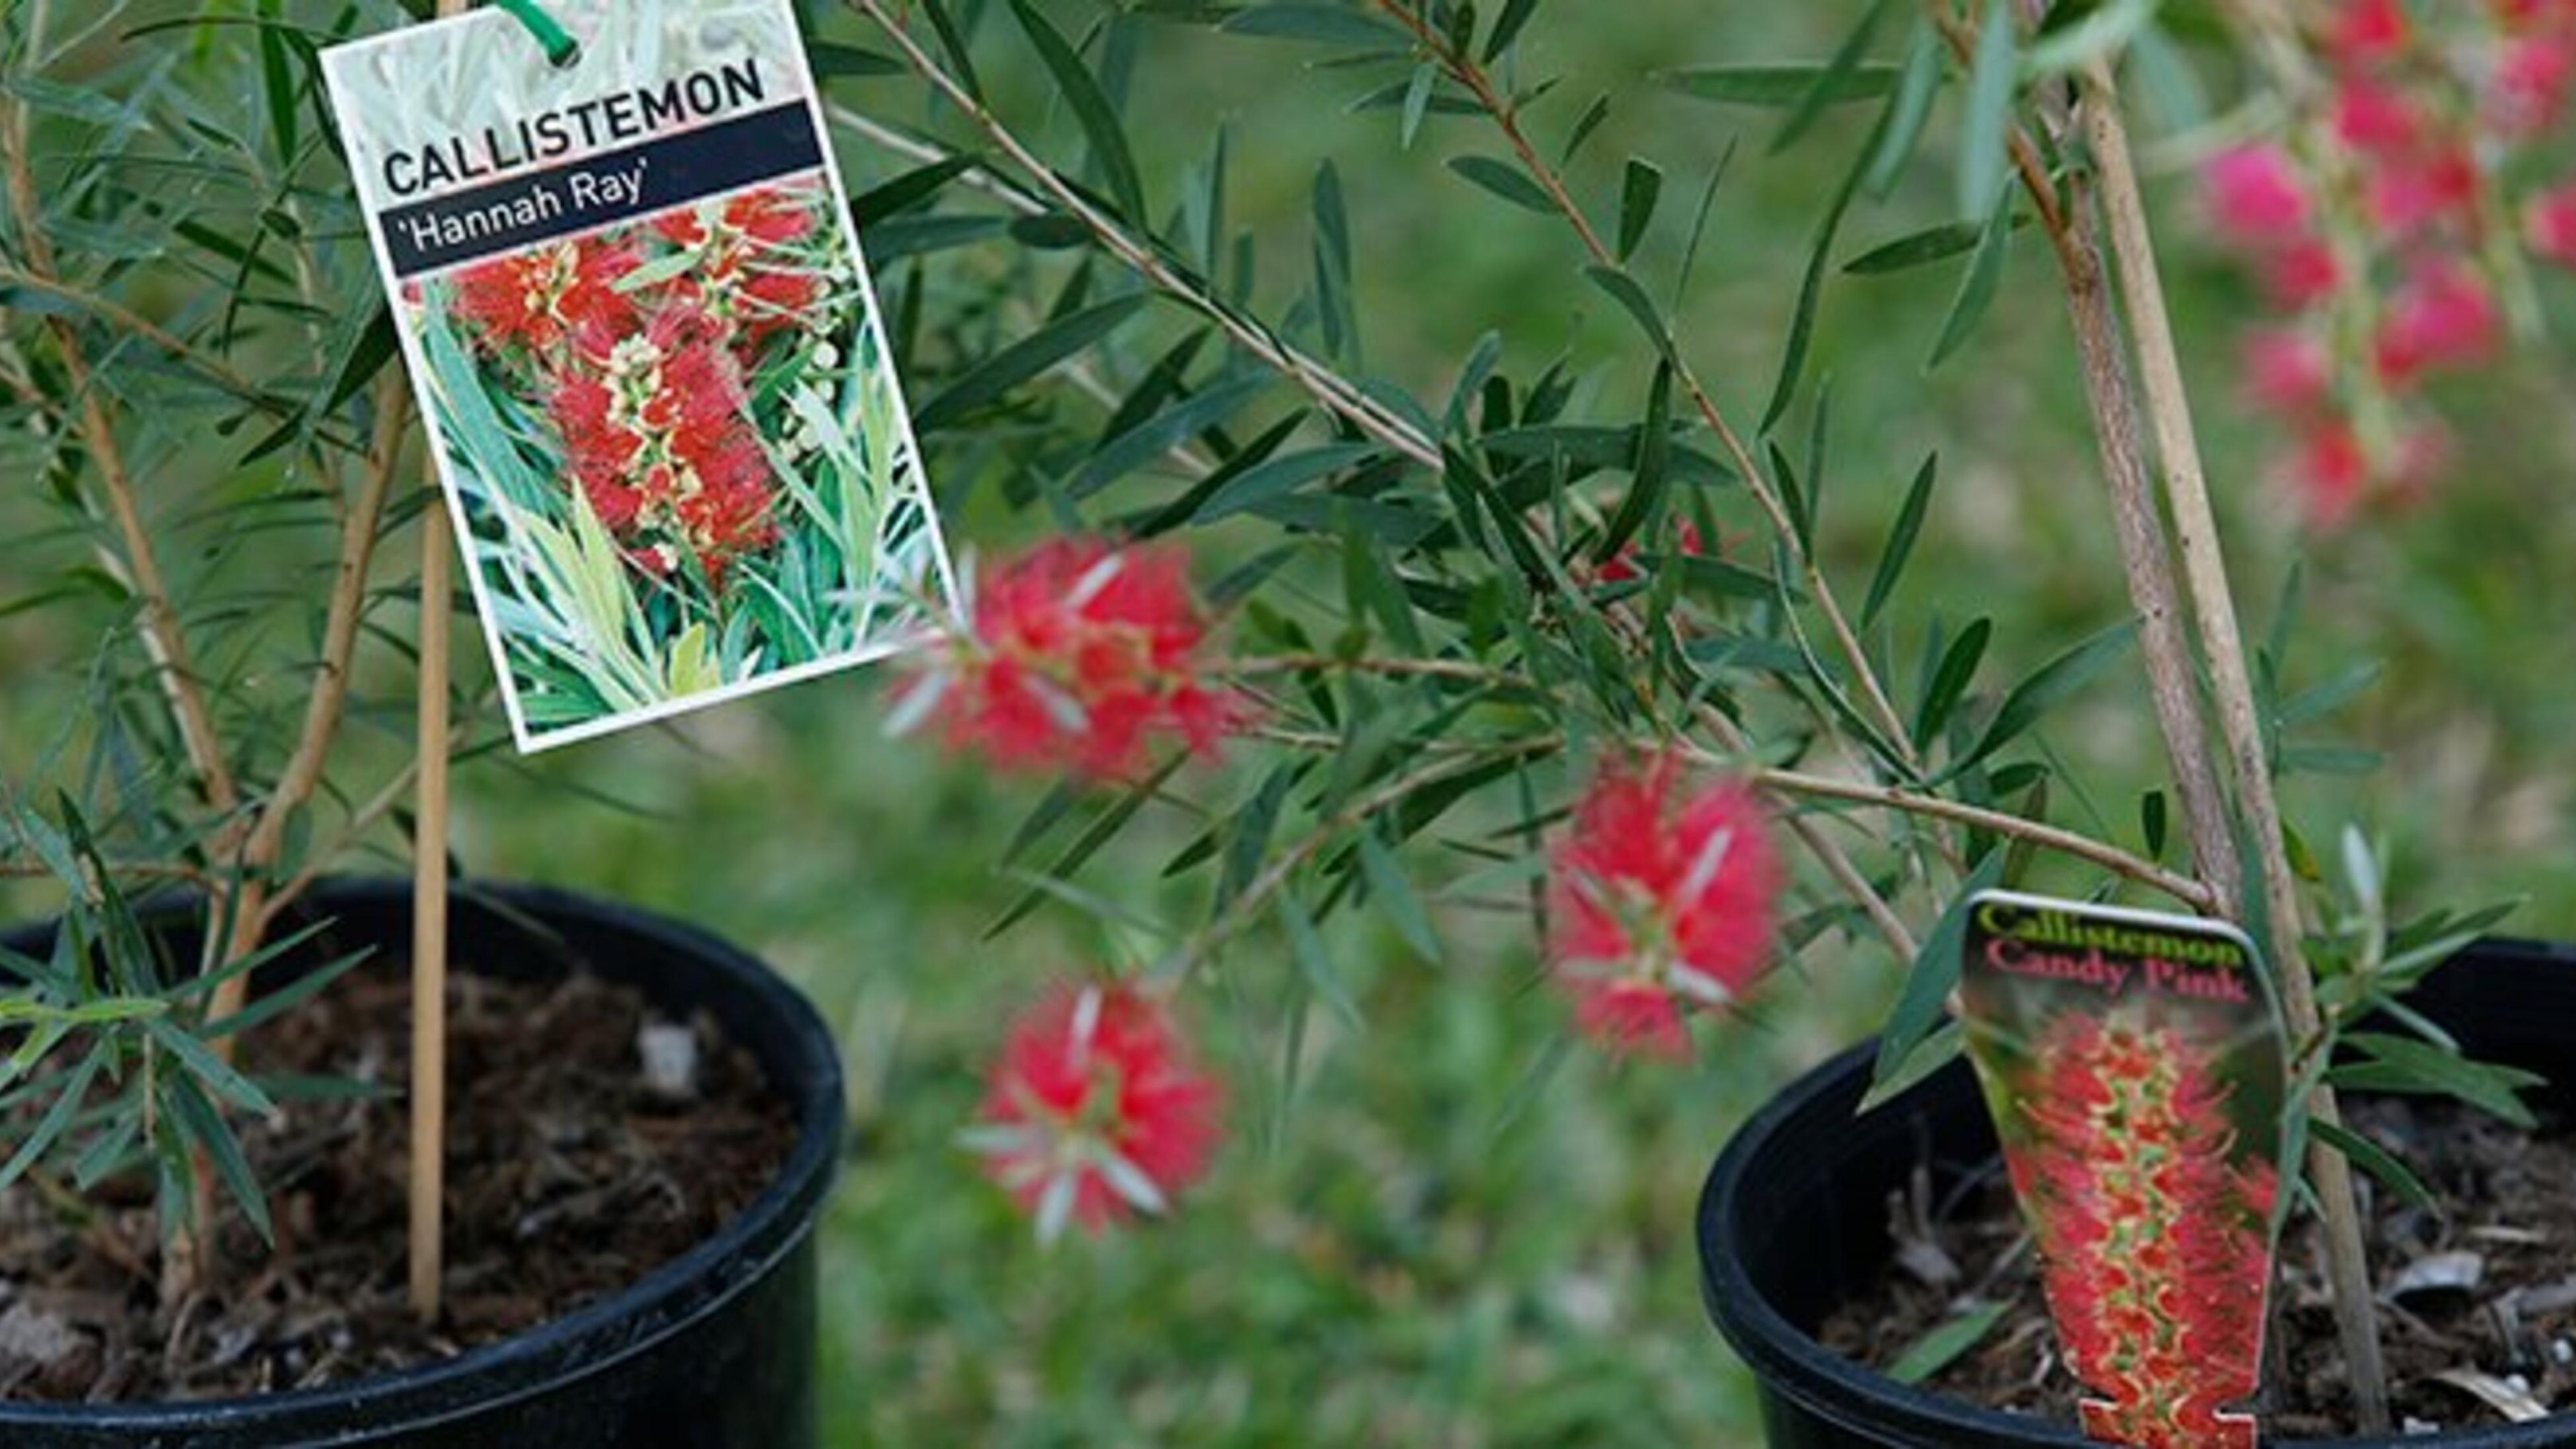 Callistemon 'Hannah Ray' plants in pots